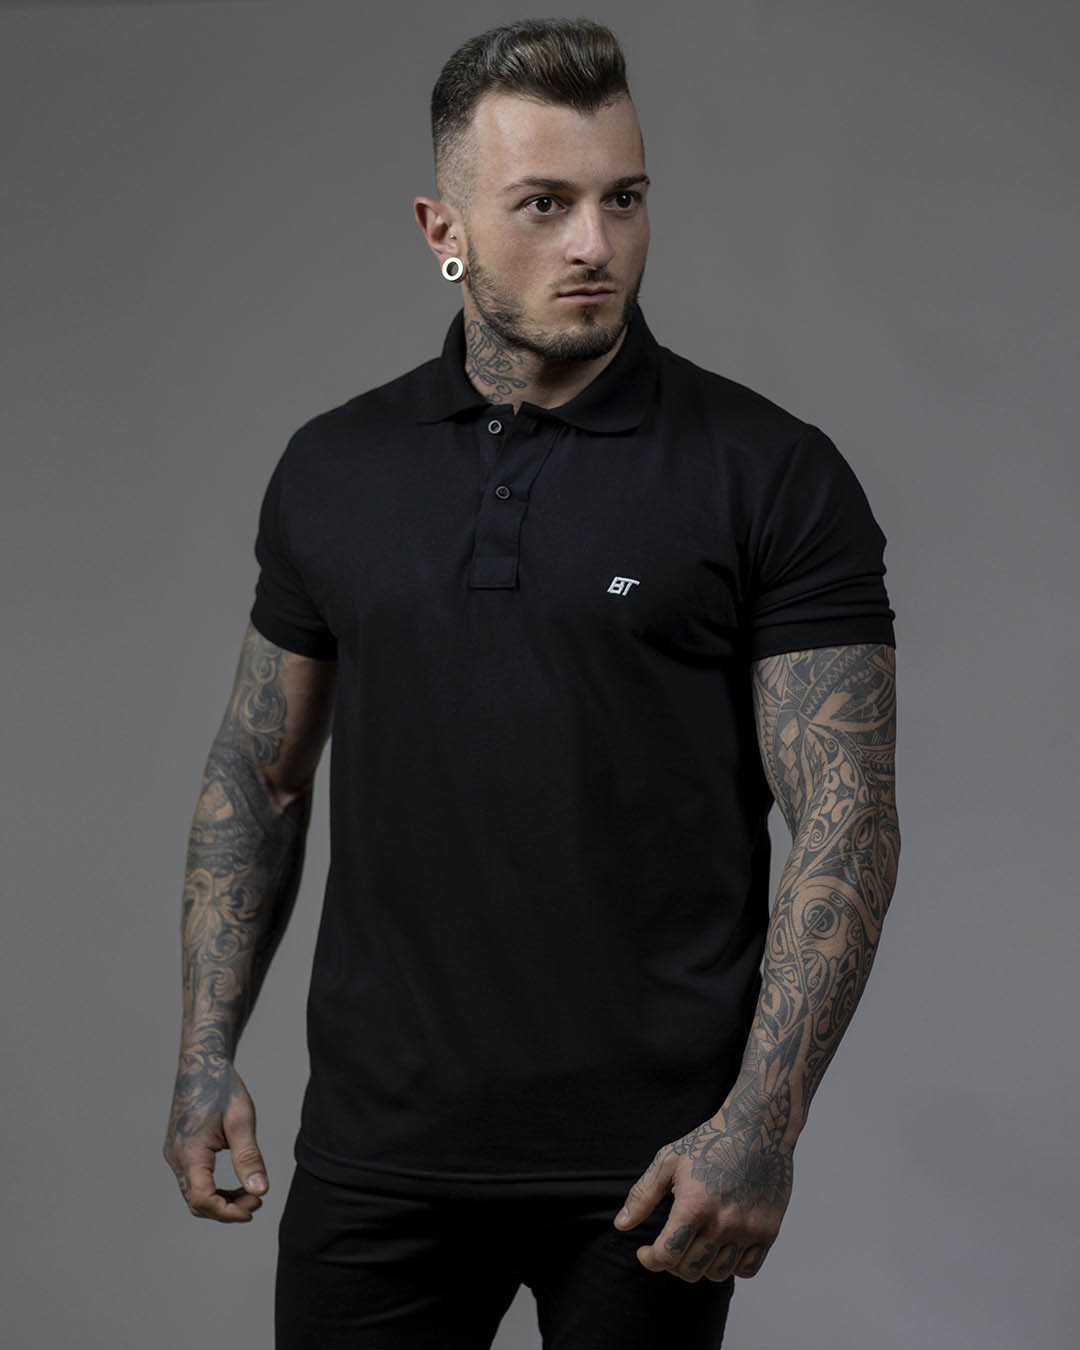 Camiseta Polo Masculina Preta Underground BT